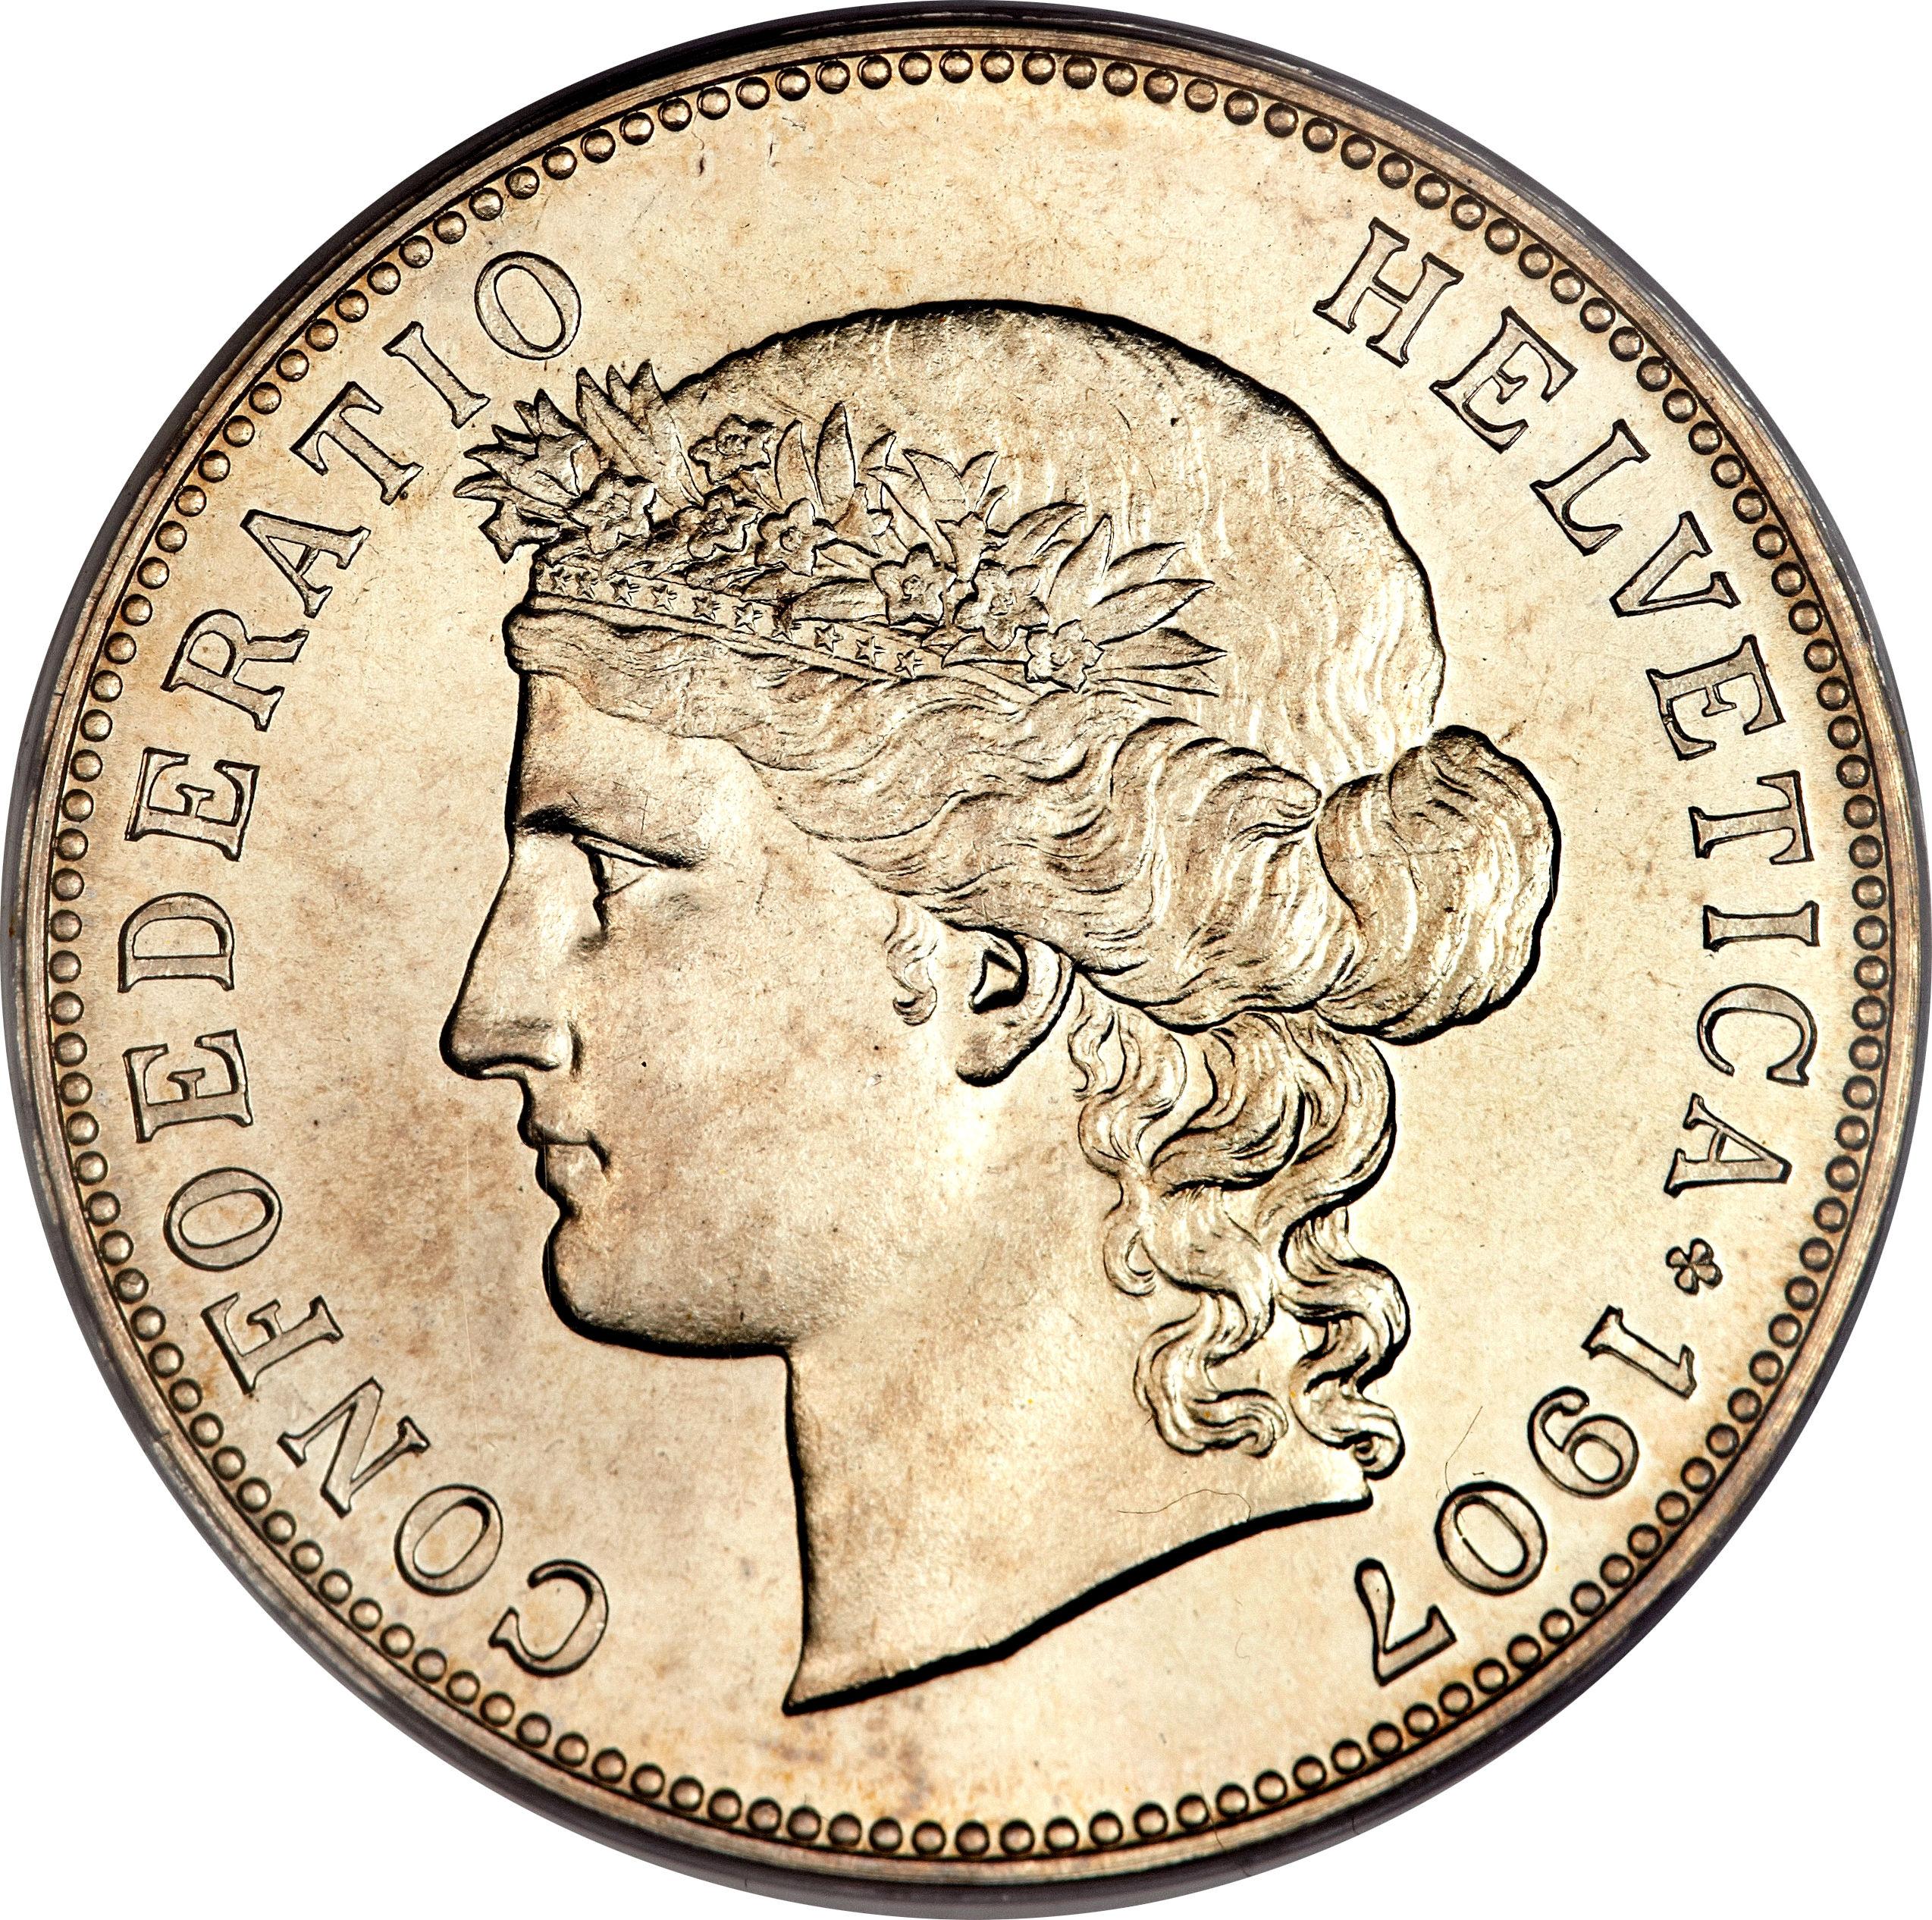 confoederatio helvetica coin 5